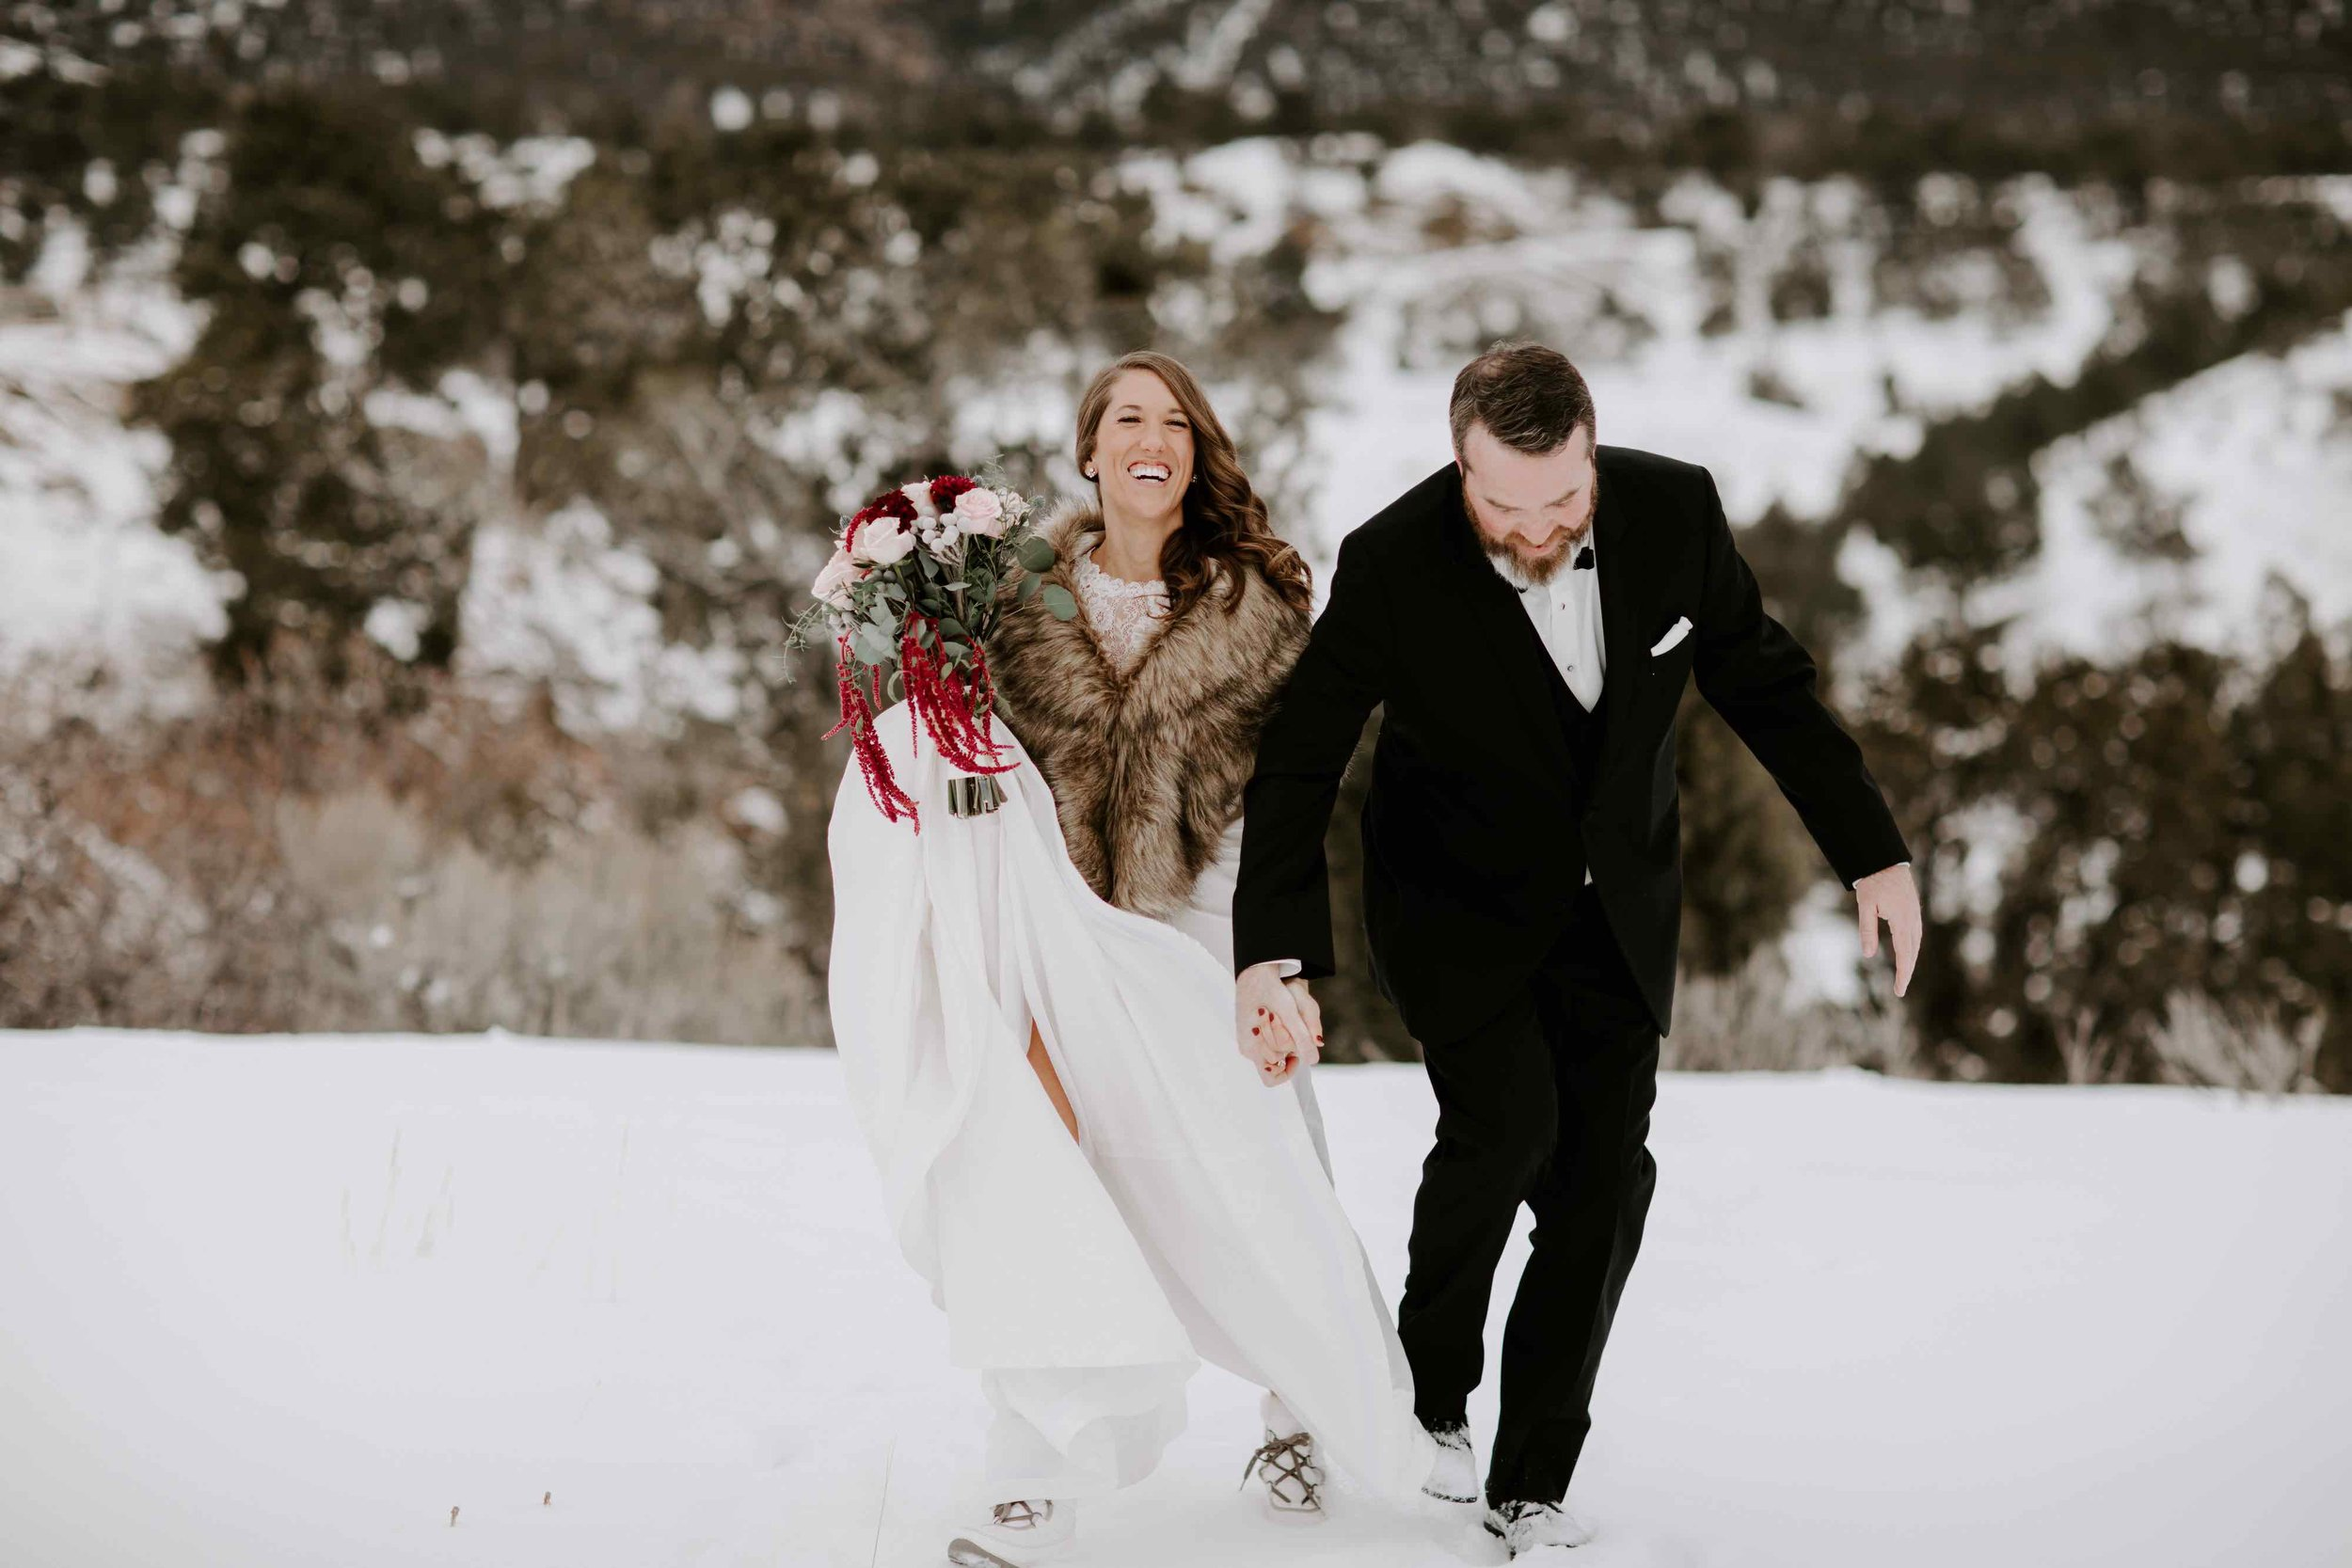 Kisa Conrad Favorites-0034-colorado-wedding-photographer-denver-springs-vailhotel-glenwood-springs-colorado-wedding-photographer.jpeg